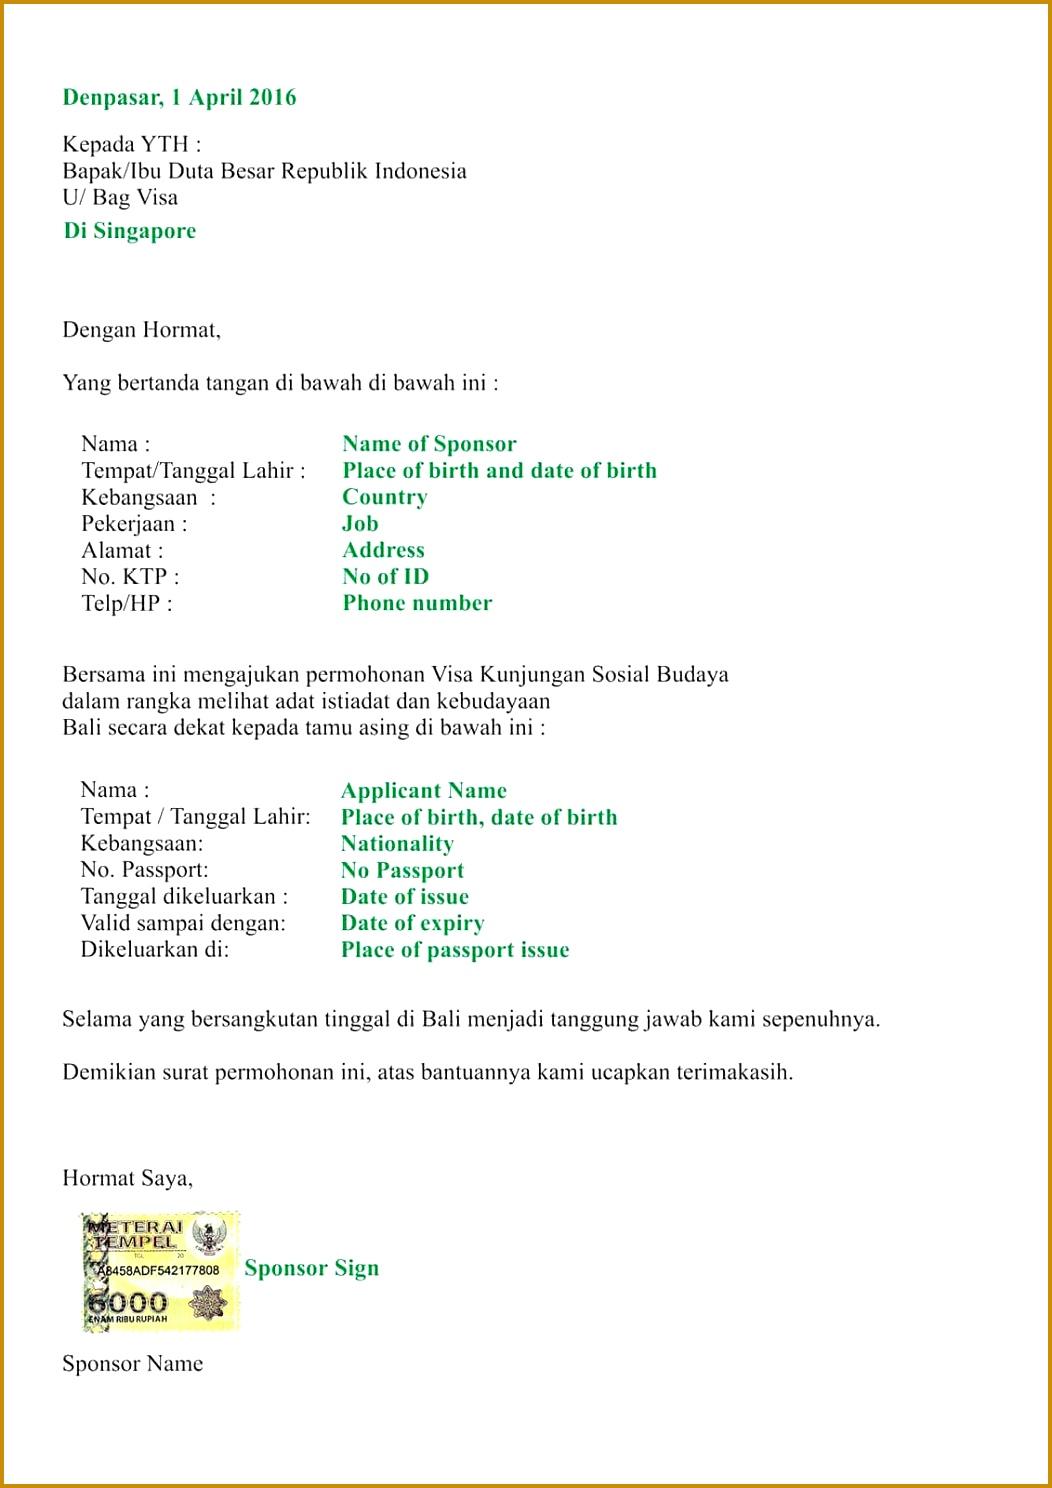 Sponsorship Letter Baliviza 14881052